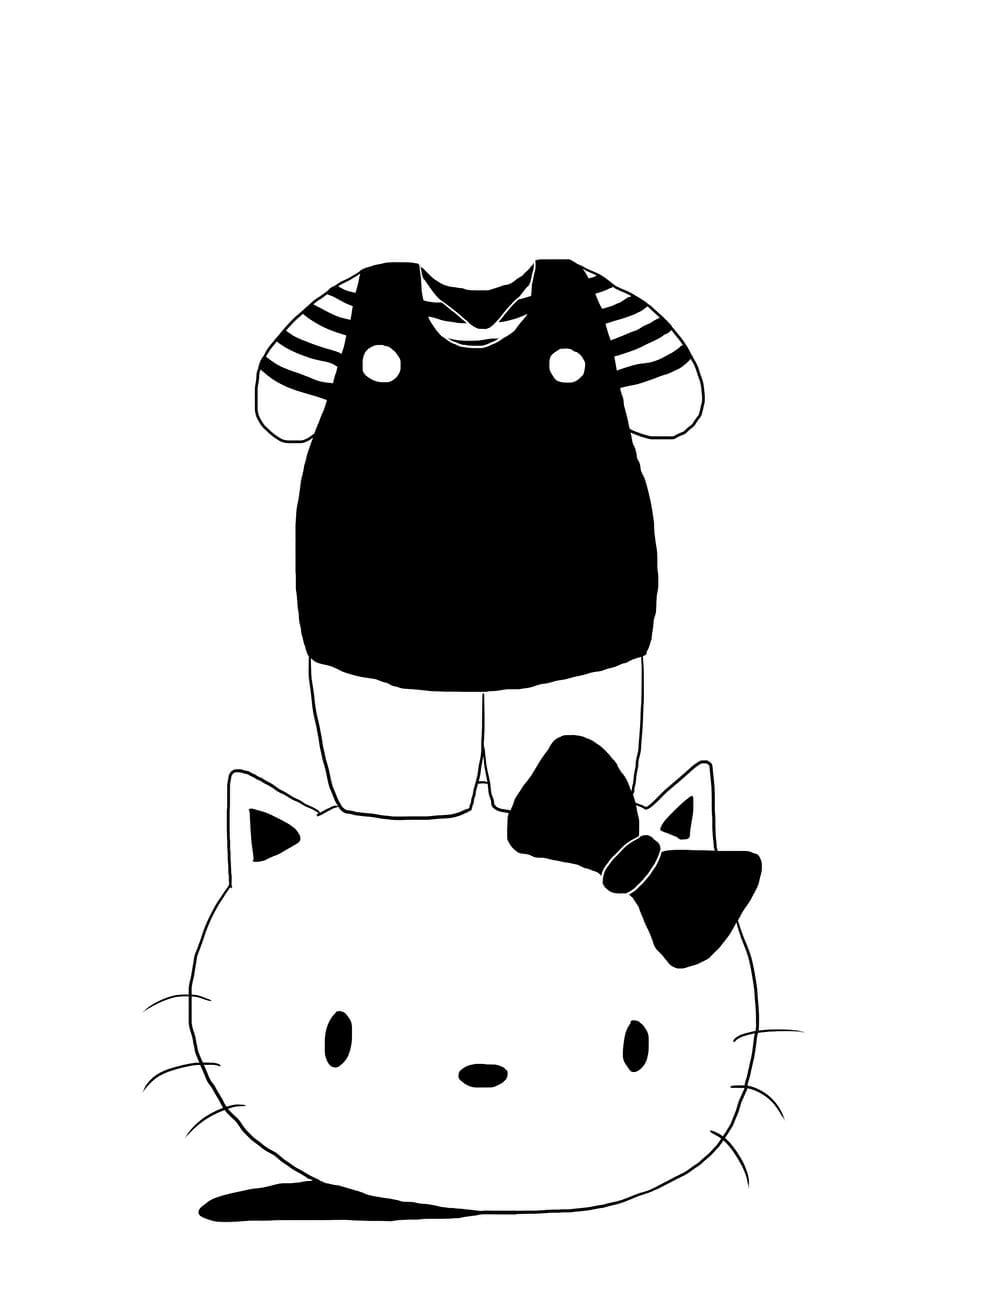 Hello Kitty absurde qui marche sur sa propre tête.